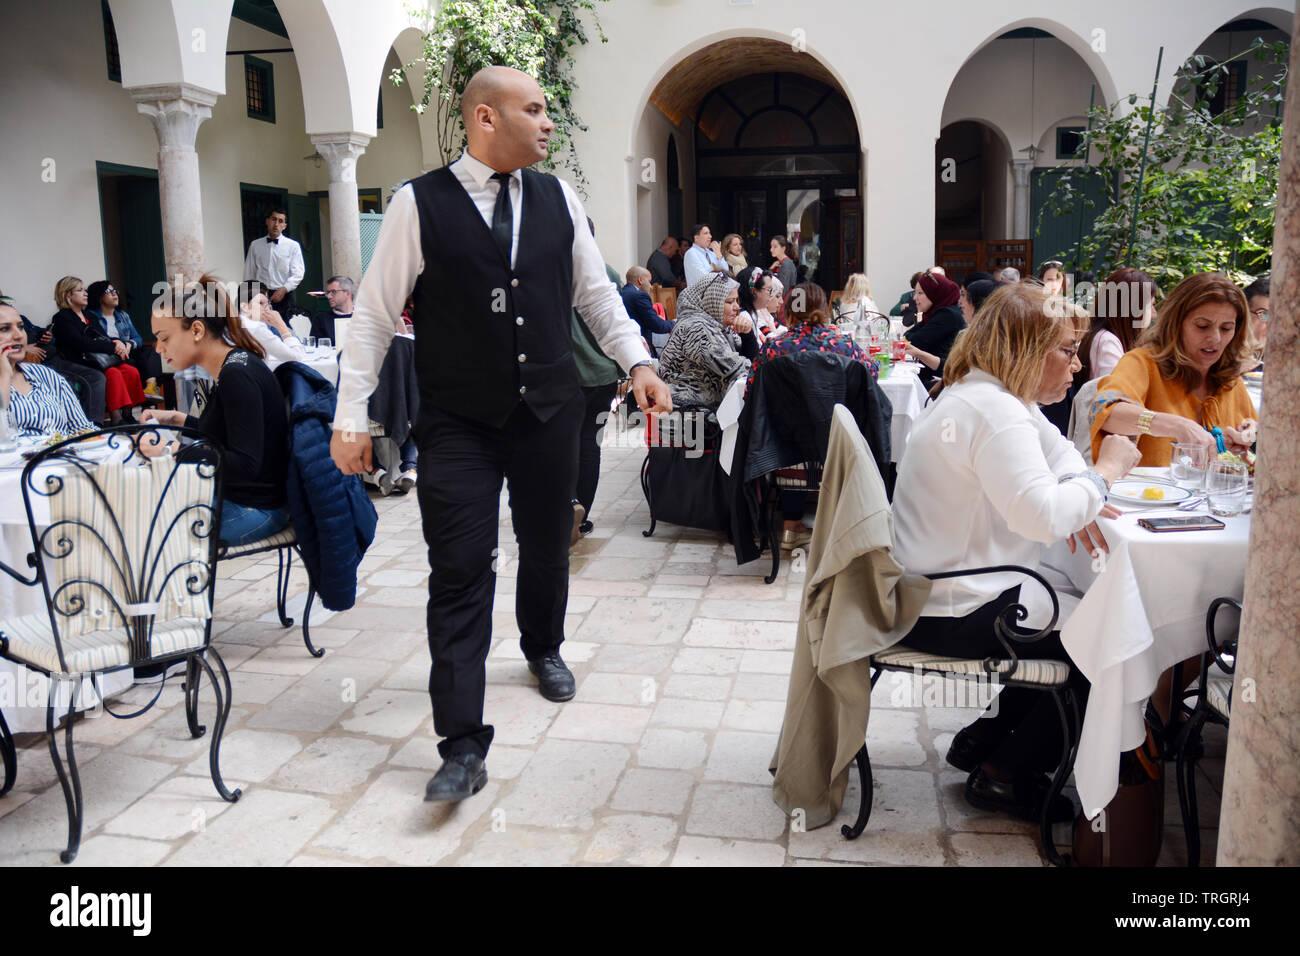 Tunisians having lunch at Fondouk El Attarine - a fine dining restaurant serving traditional Tunisian cuisine in the Medina of Tunis, Tunisia. Stock Photo